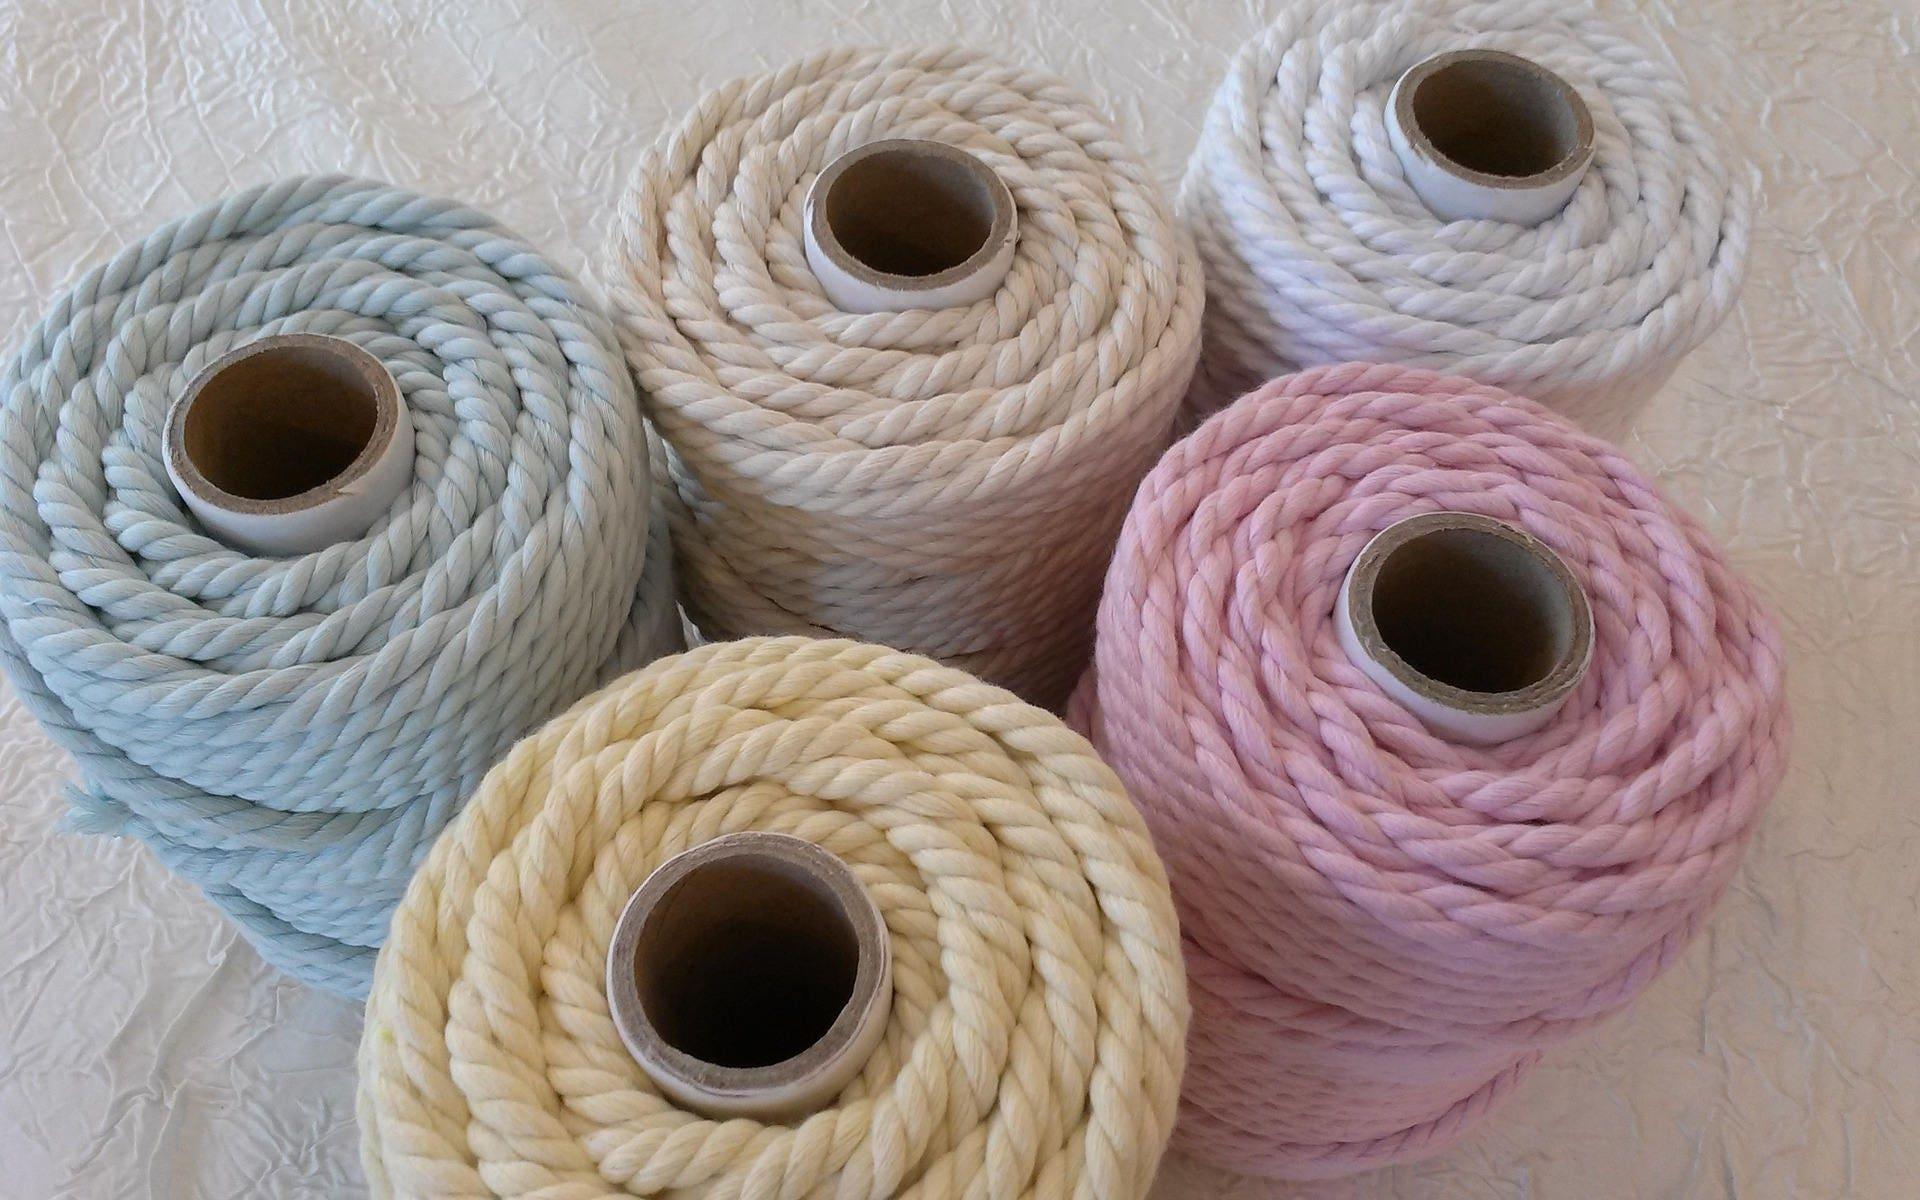 corde macram lot 5 bobines de corde macram en coton 100. Black Bedroom Furniture Sets. Home Design Ideas